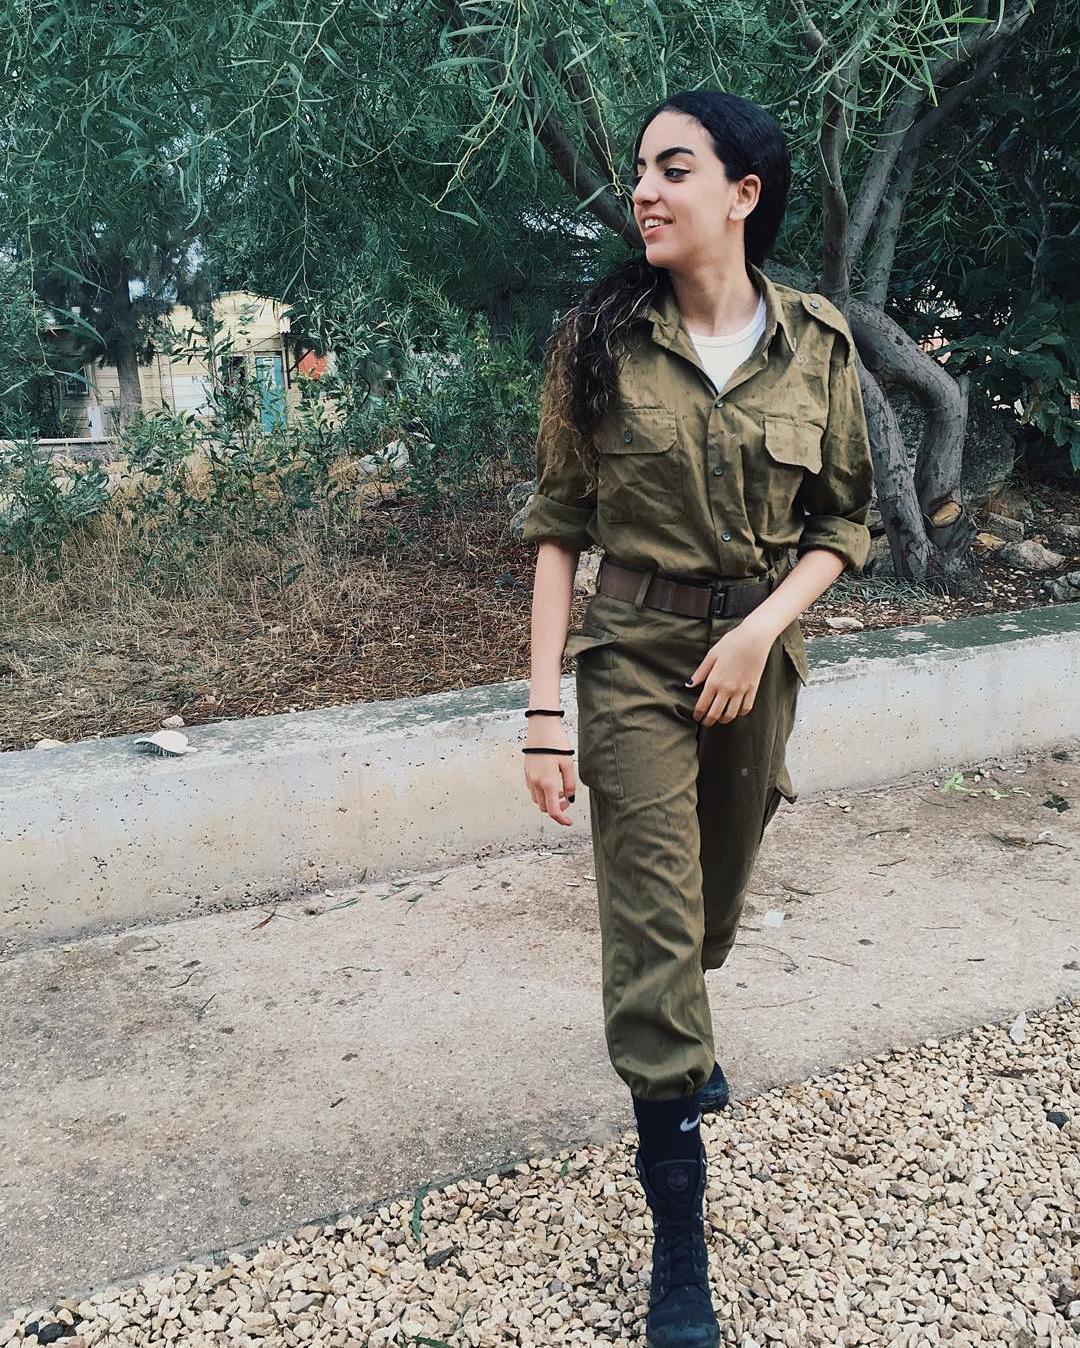 Single army women